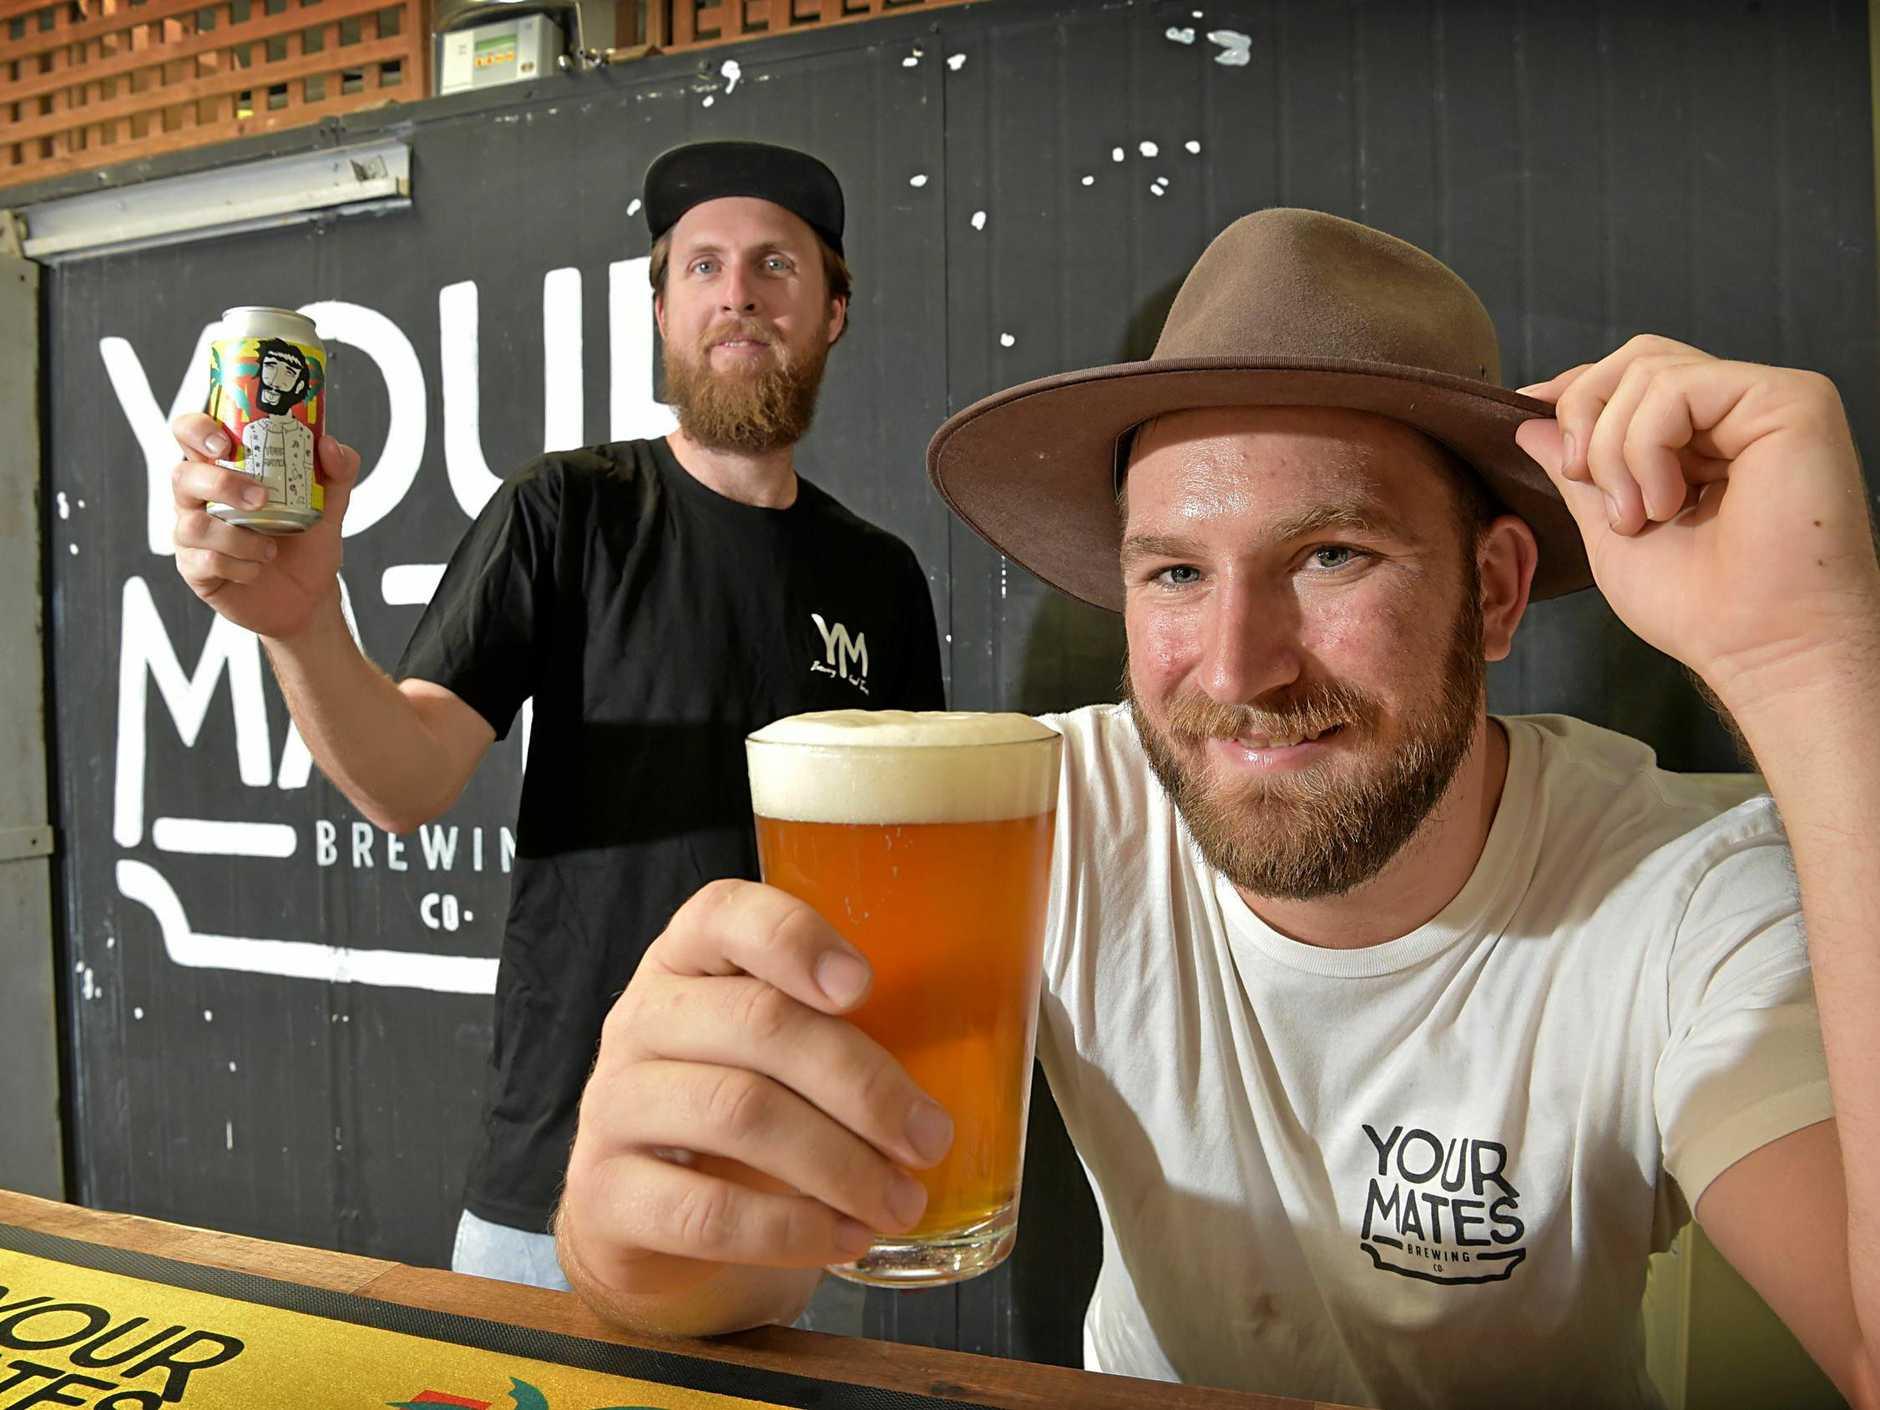 Opening of Your Mates Brewing Co. at Caloundra.Matt Hepburn (right) enjoys a beer with Christian McGarry.